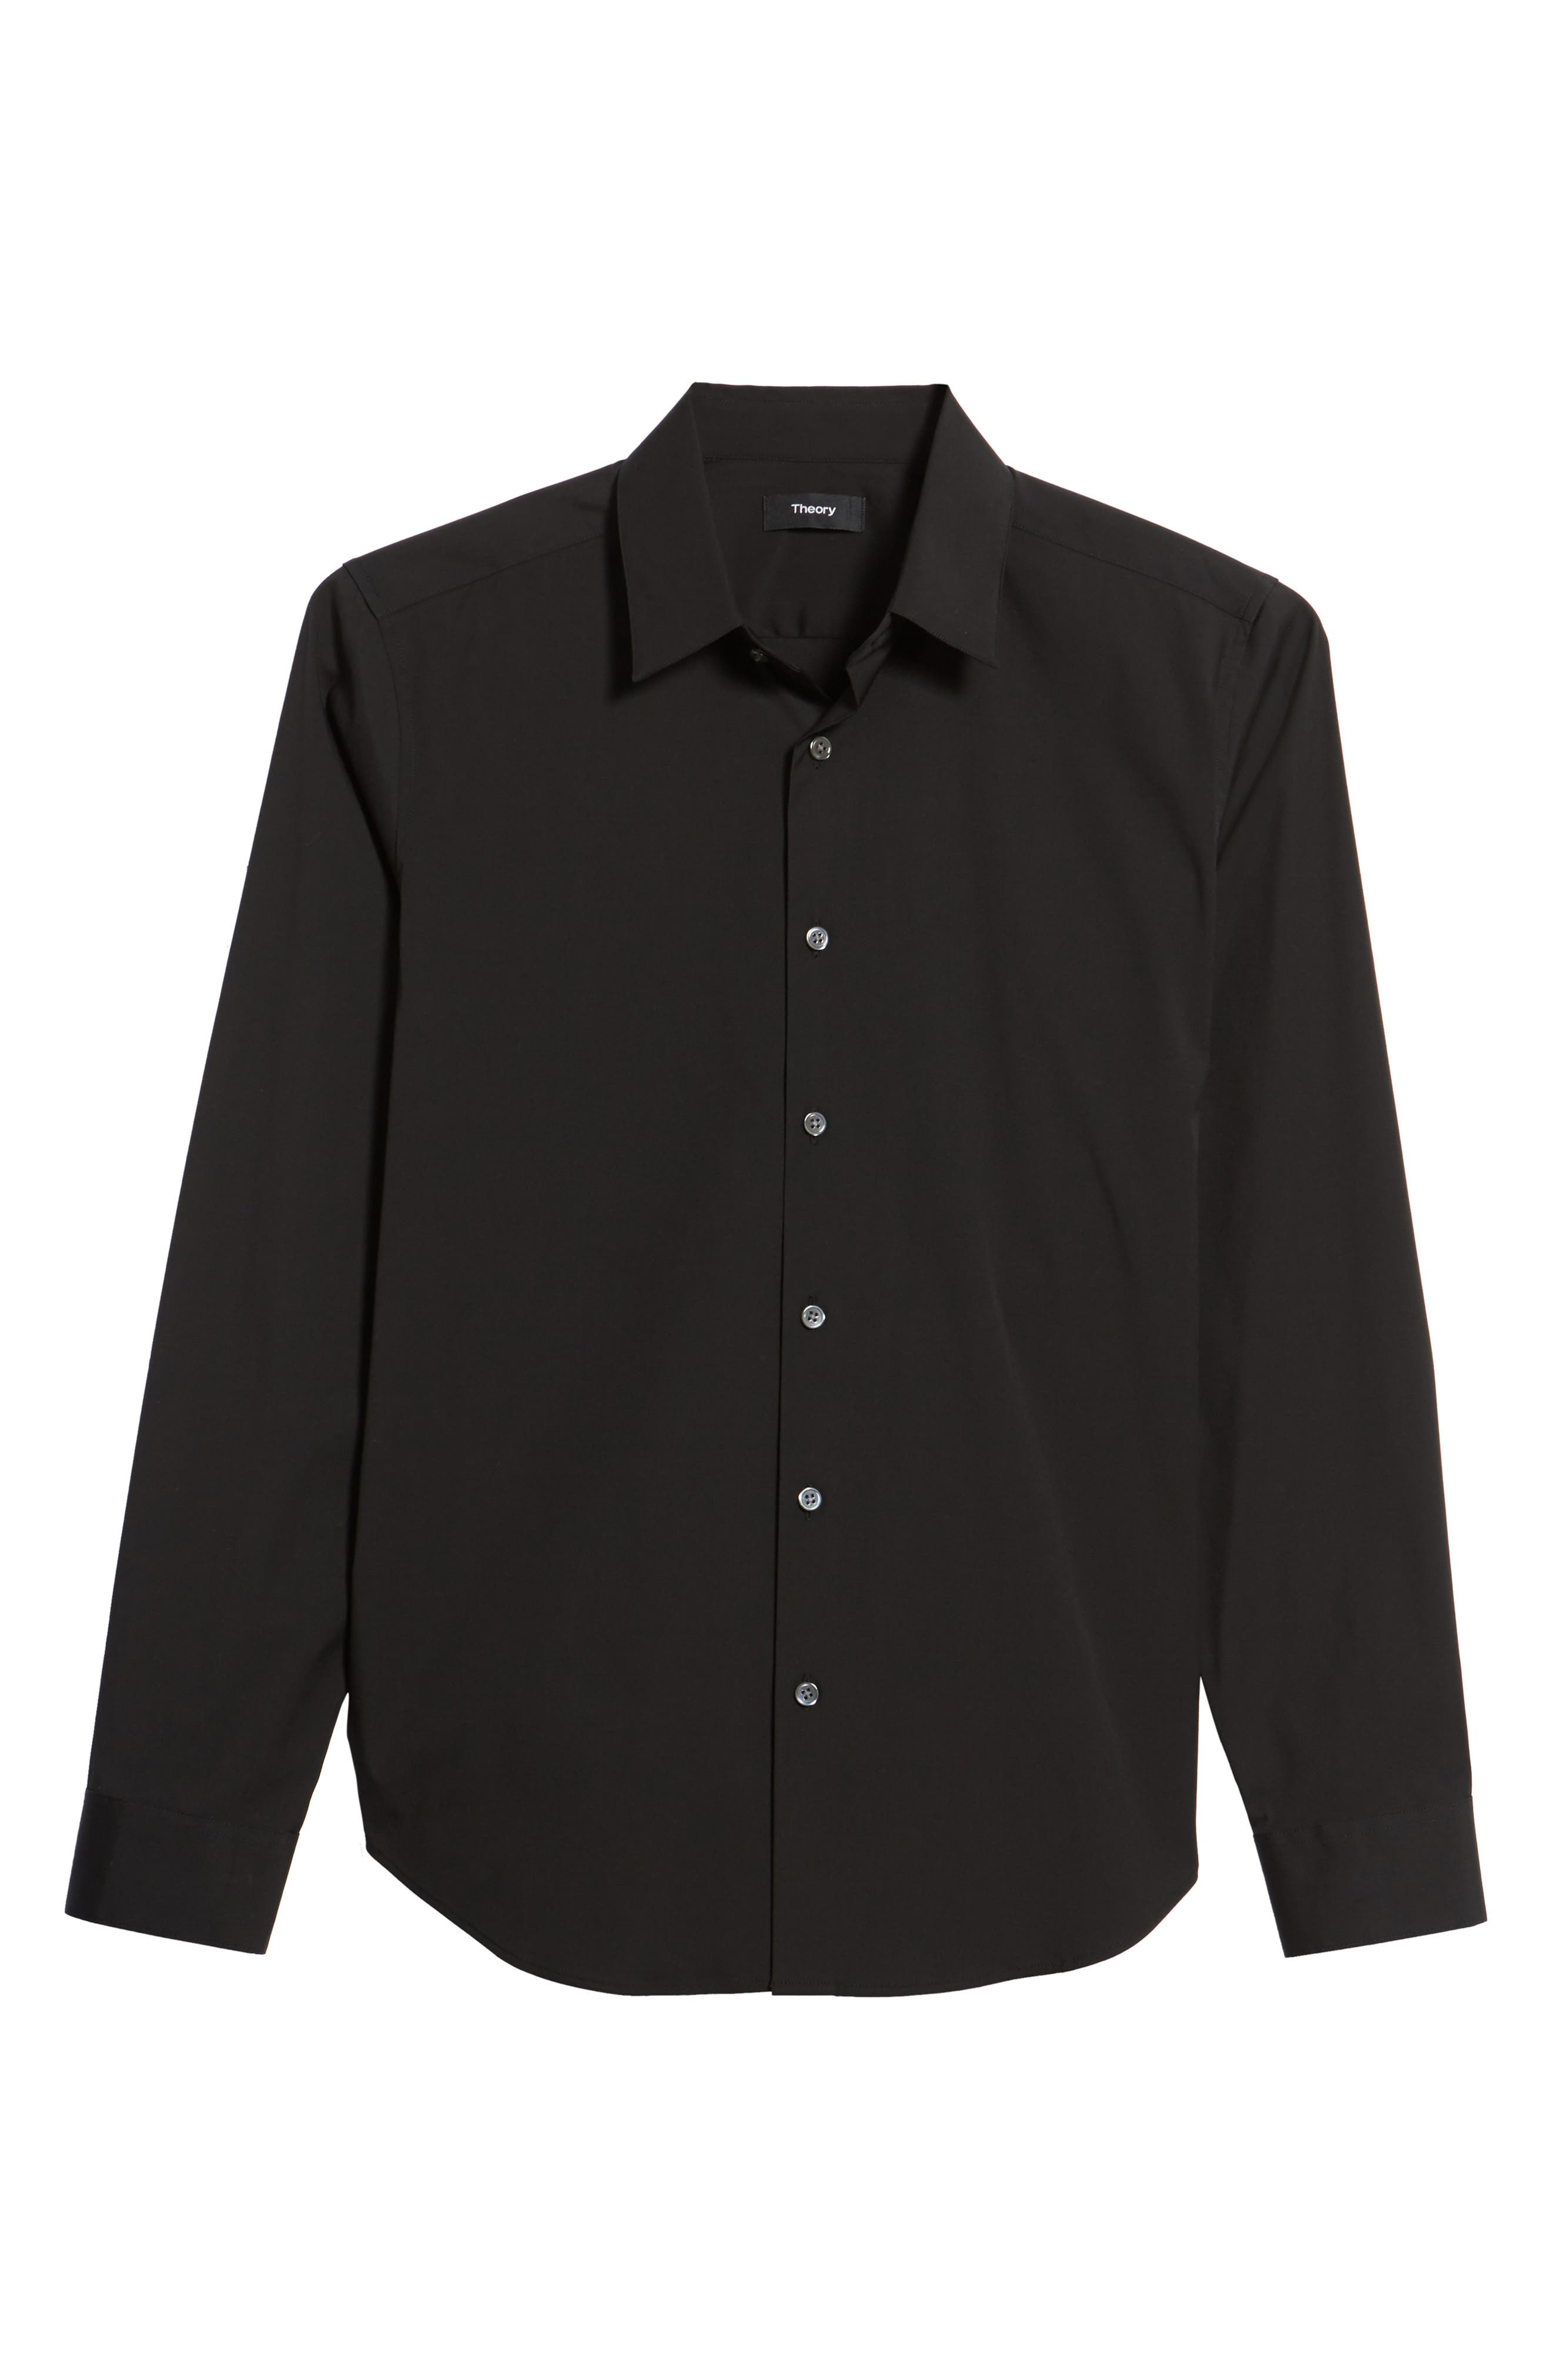 'Sylvain' Trim Fit Long Sleeve Sport Shirt,                             Alternate thumbnail 2, color,                             BLACK